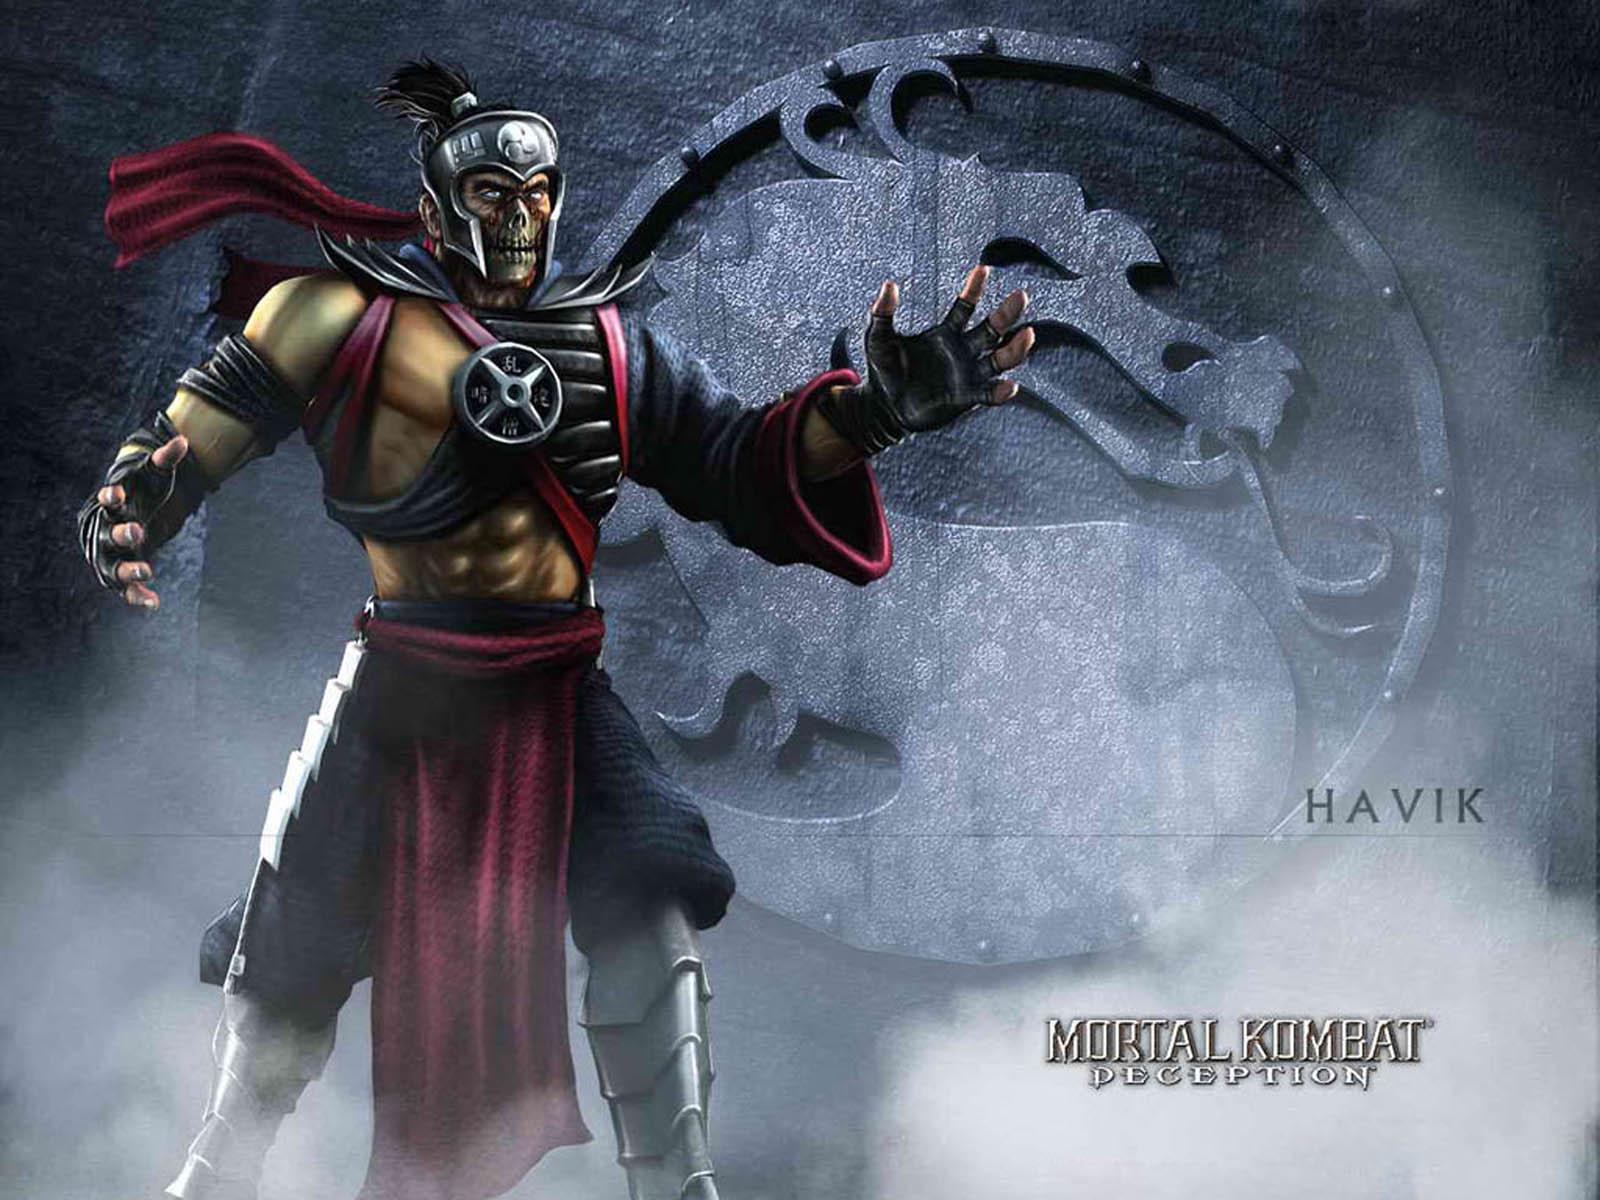 wallpapers: Mortal Kombat Game Wallpapers - photo#16